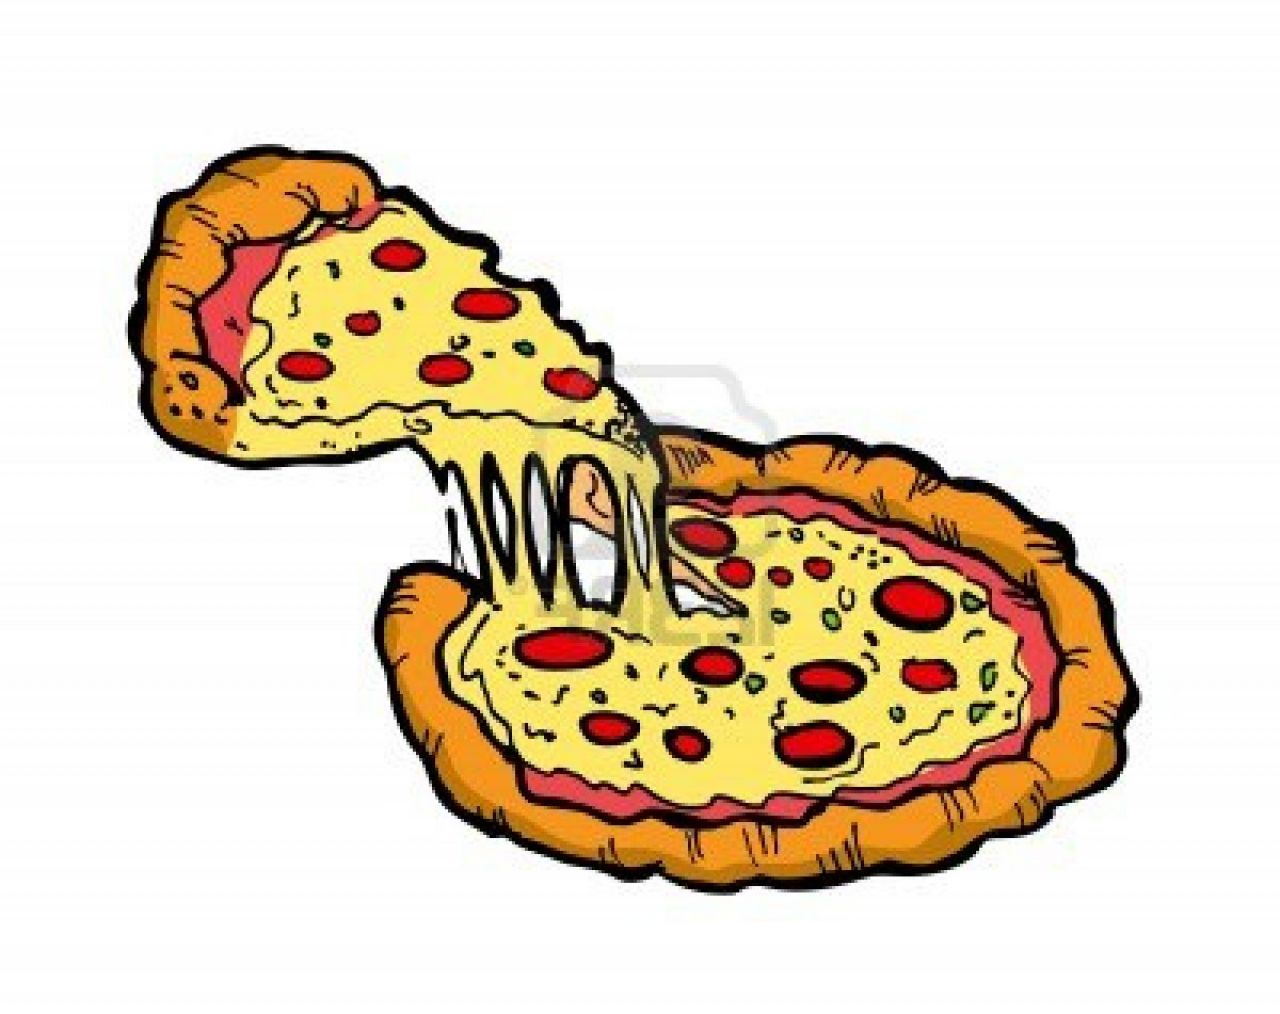 Whole Pepperoni Pizza Clipart Pizza Clip-Whole Pepperoni Pizza Clipart Pizza Clipart 53bde6cd2d59d Jpg-13